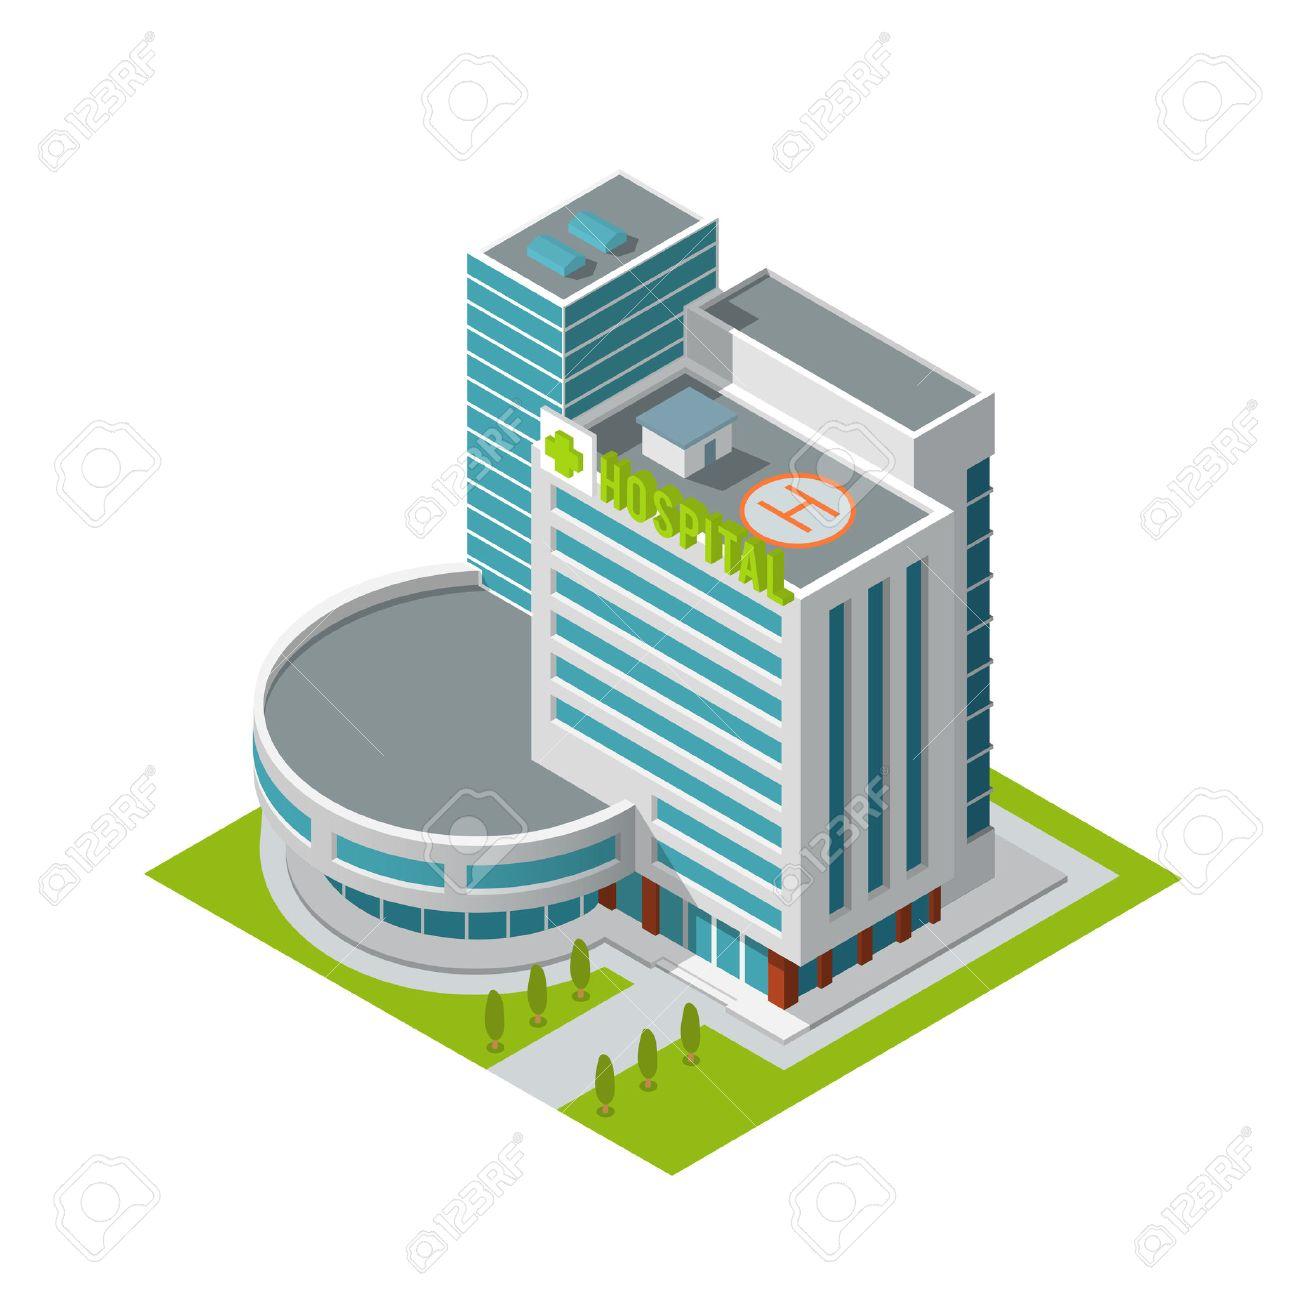 btiment de lhpital moderne 3d urbain avec hliport sur le toit isol isomtrique illustration - Hapital Moderne